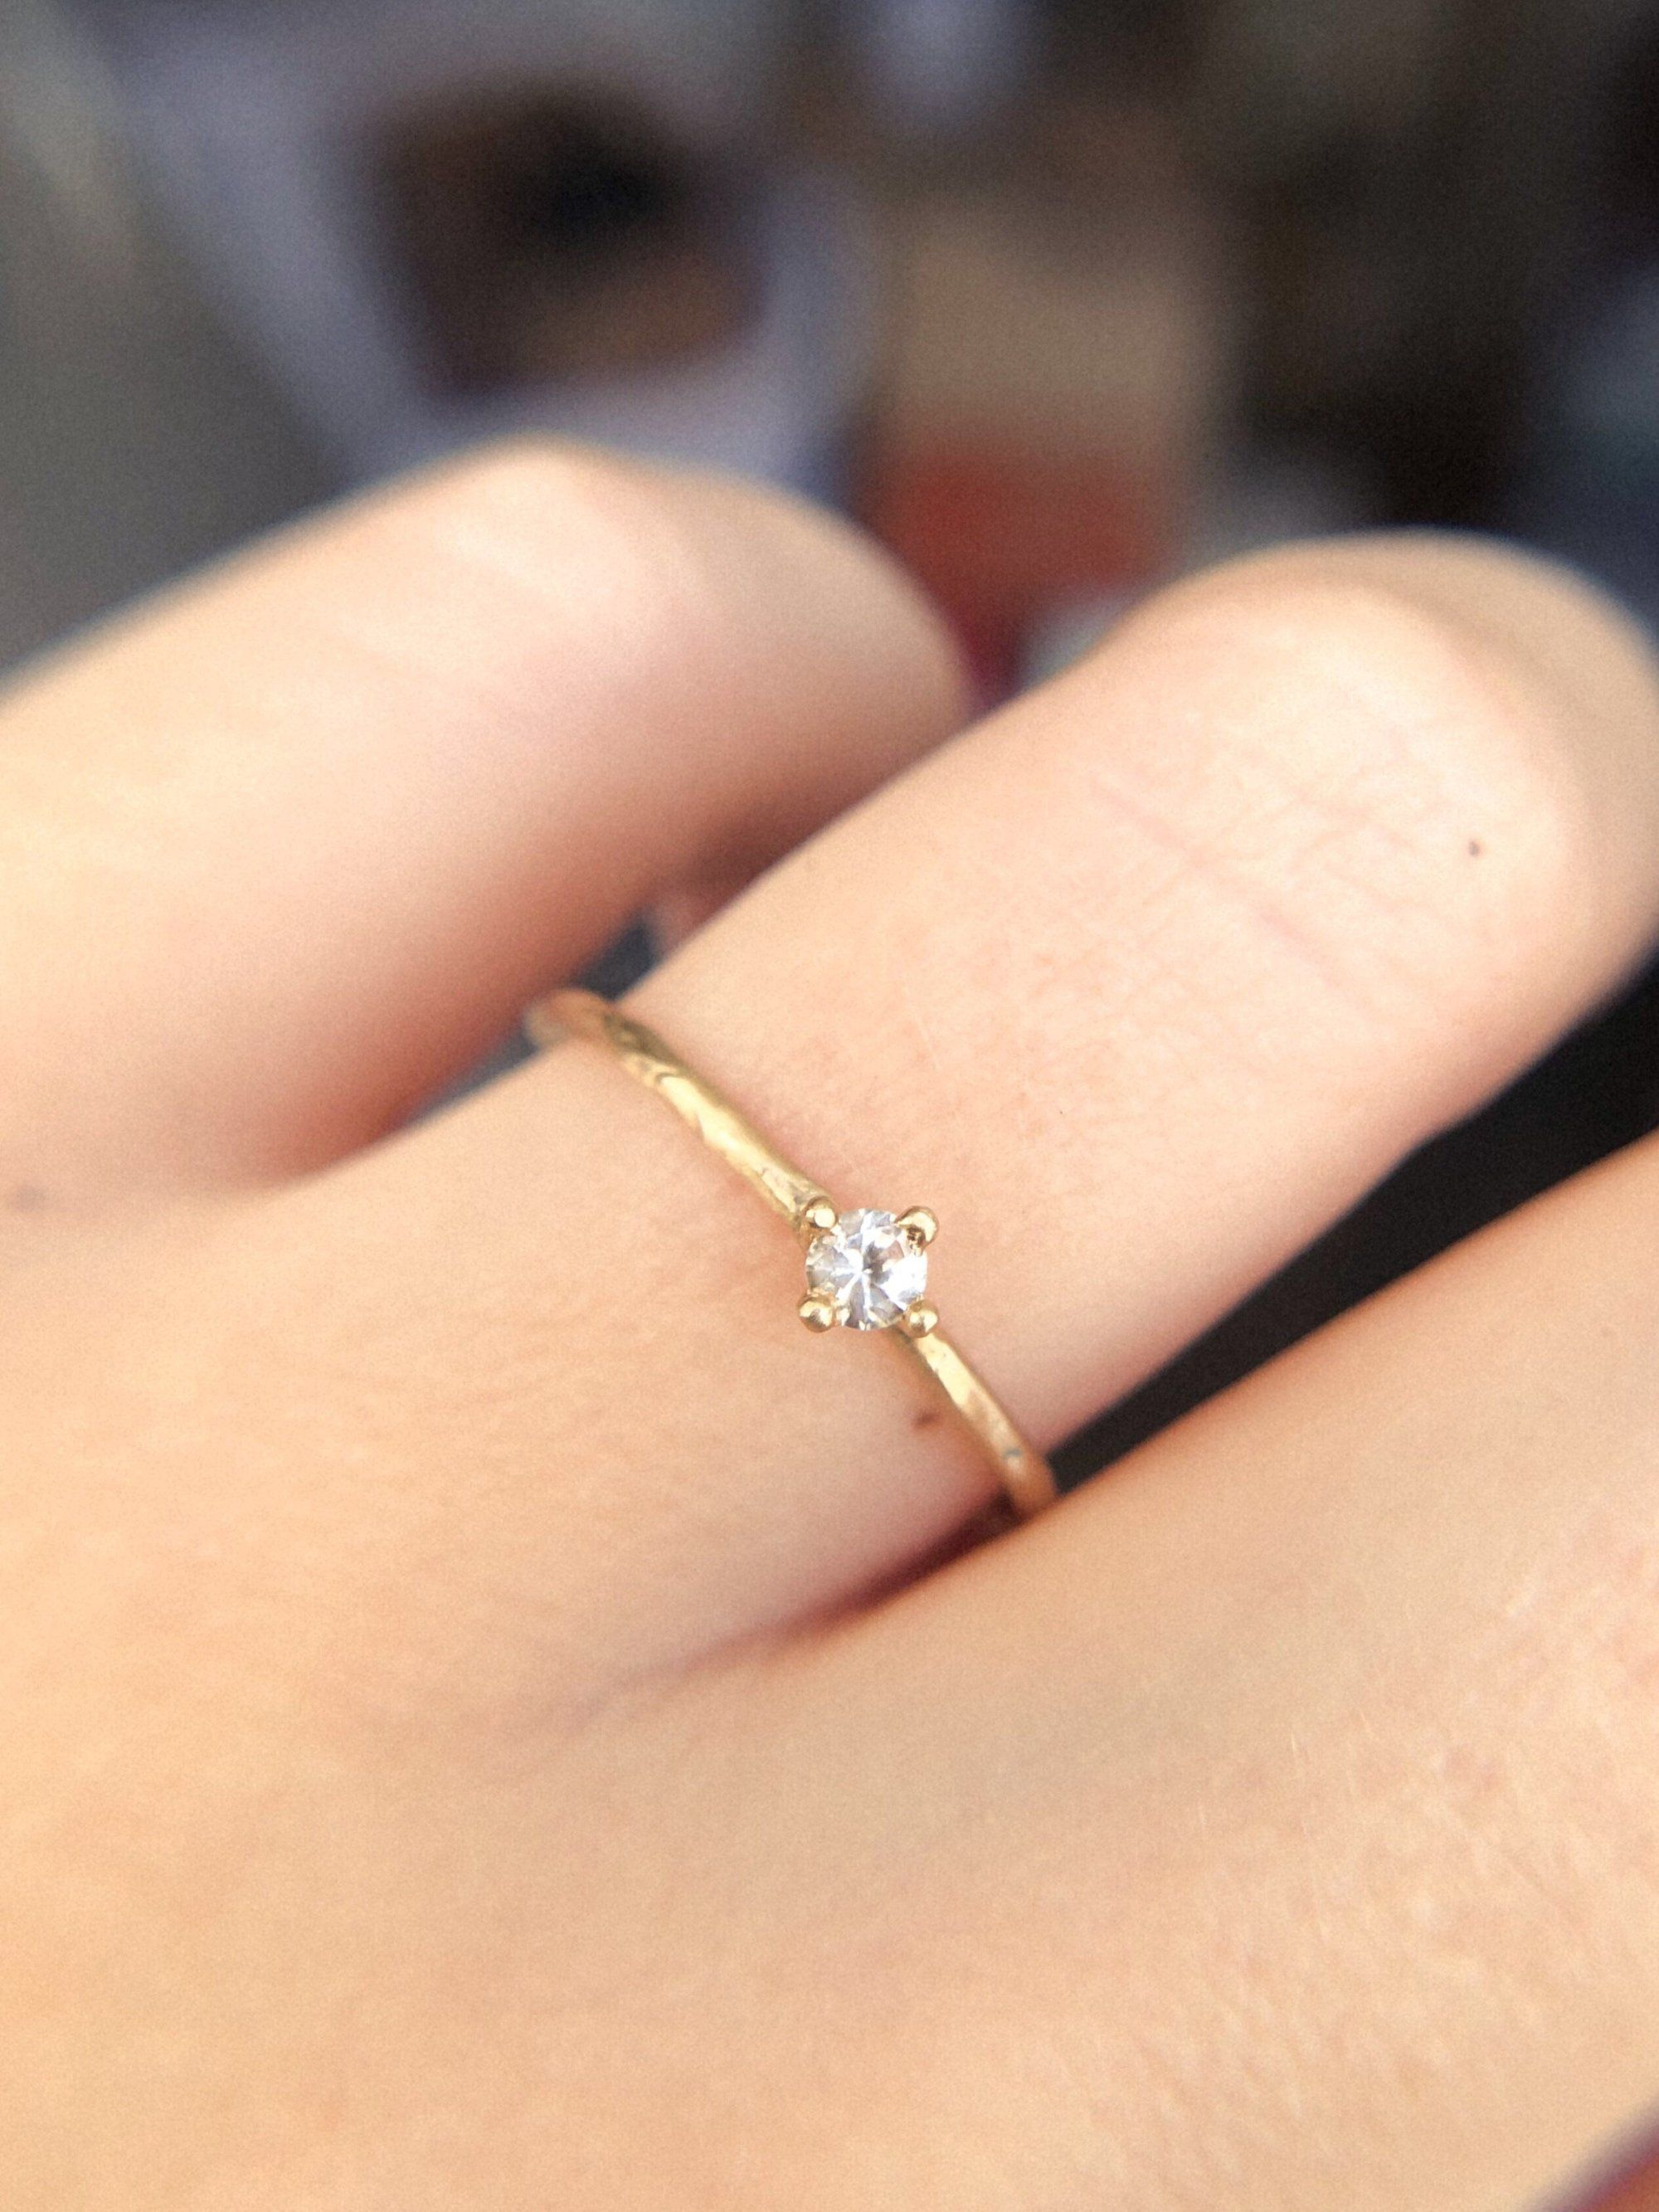 Hera Solitaire 3mm 11 Ct Unique Diamond Engagement Rings Boho Engagement Ring Unique Engagement Rings